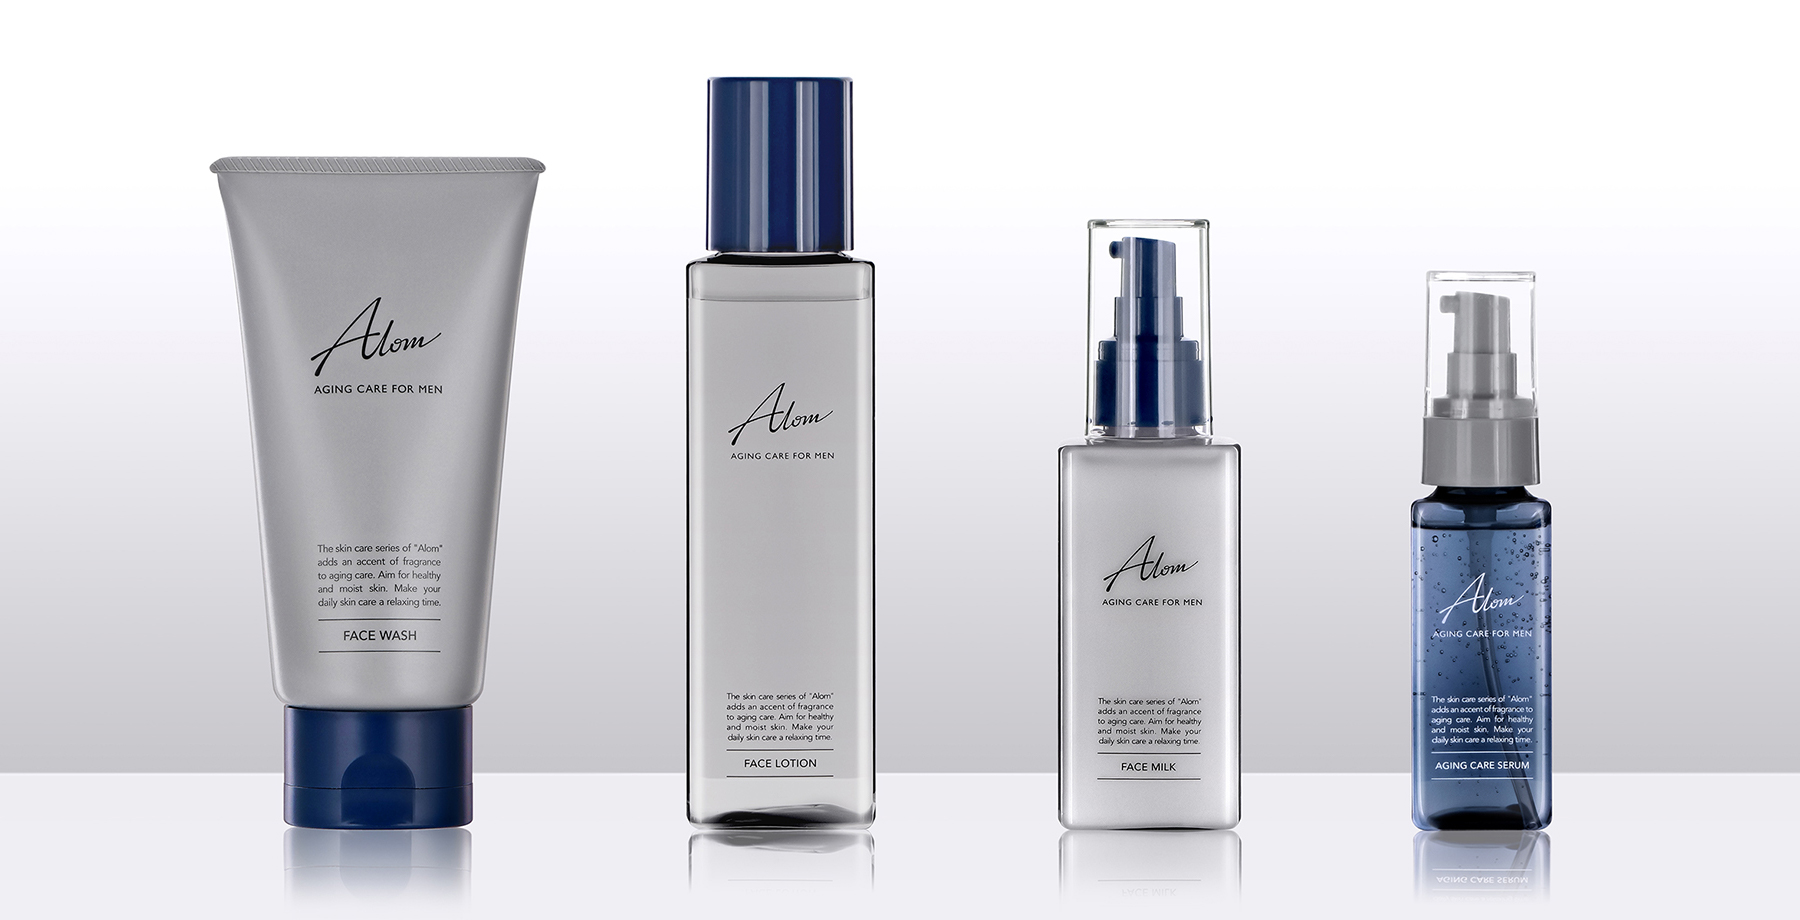 Alom 製品イメージ